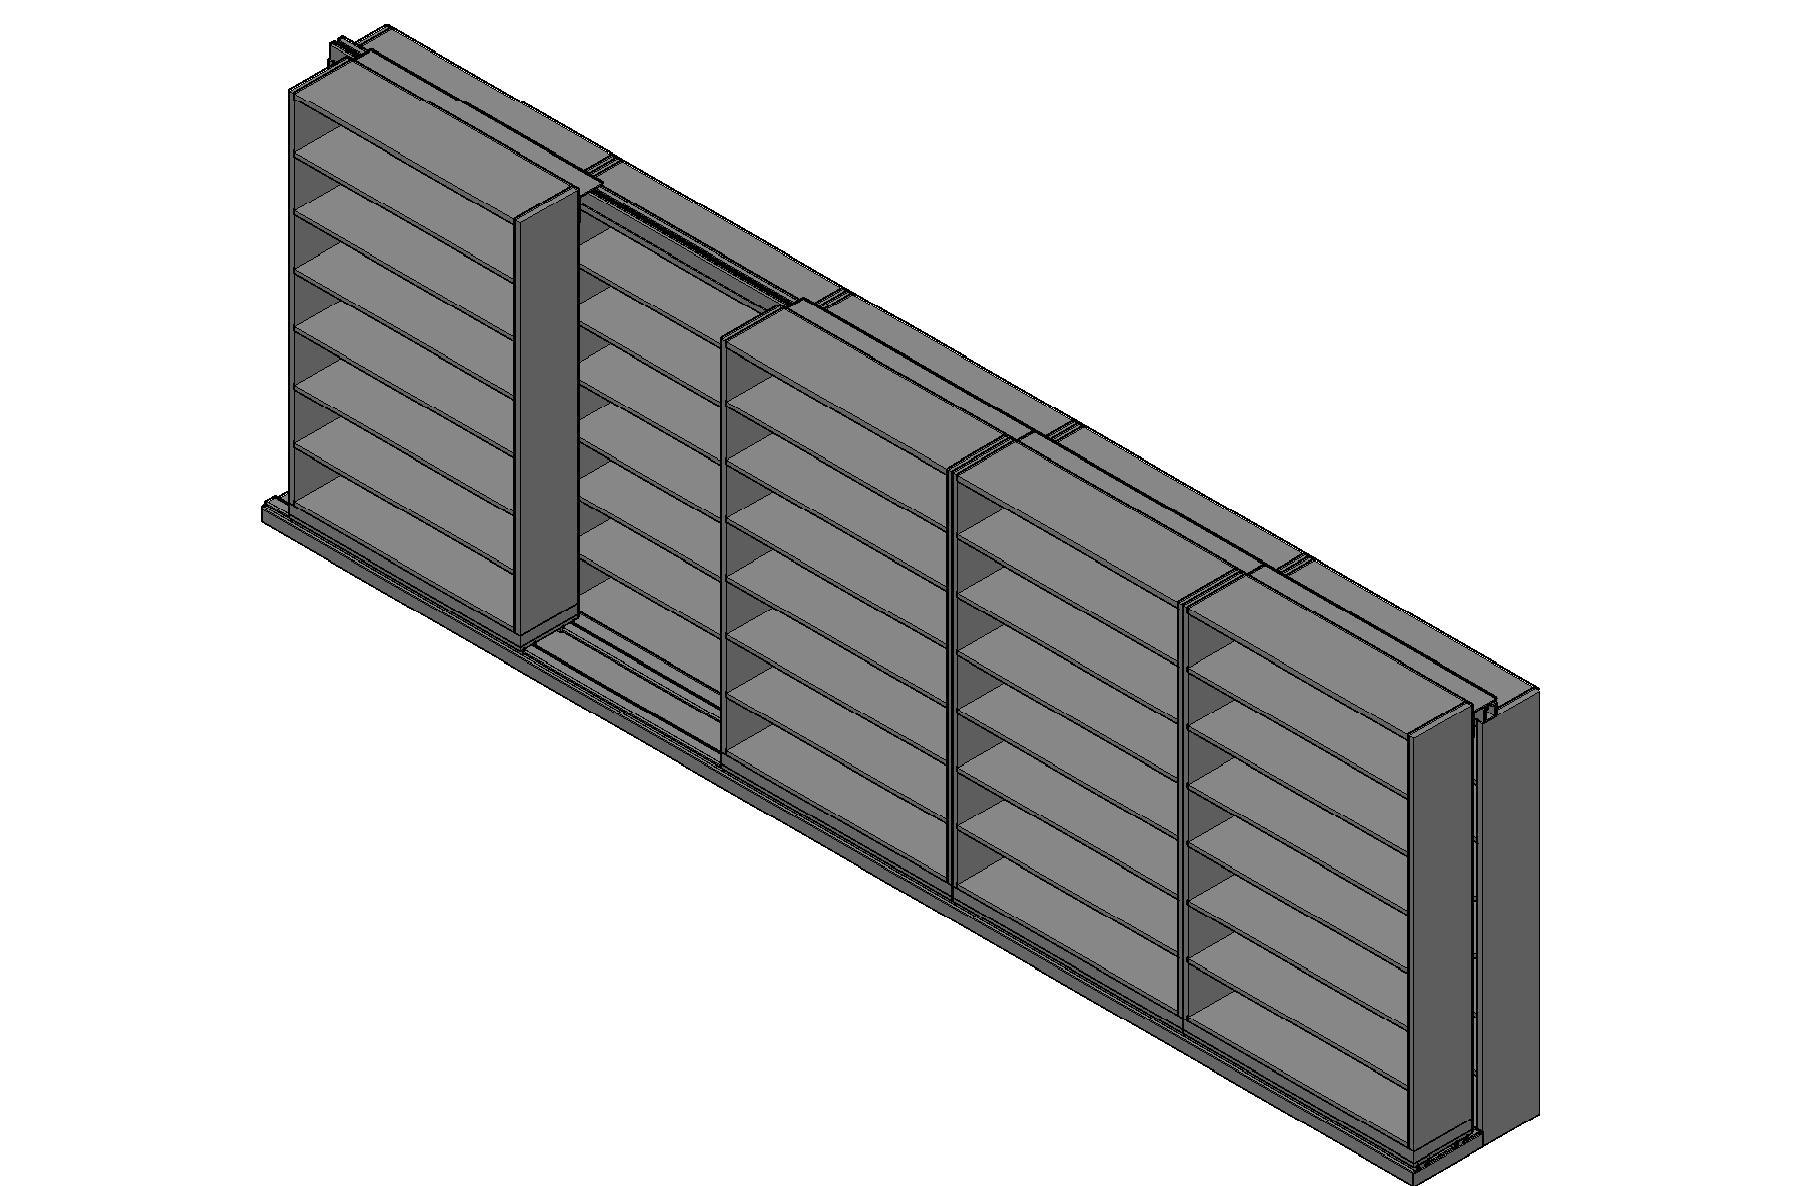 "Letter Size Sliding Shelves - 2 Rows Deep - 7 Levels - (48"" x 12"" Shelves) - 244"" Total Width"